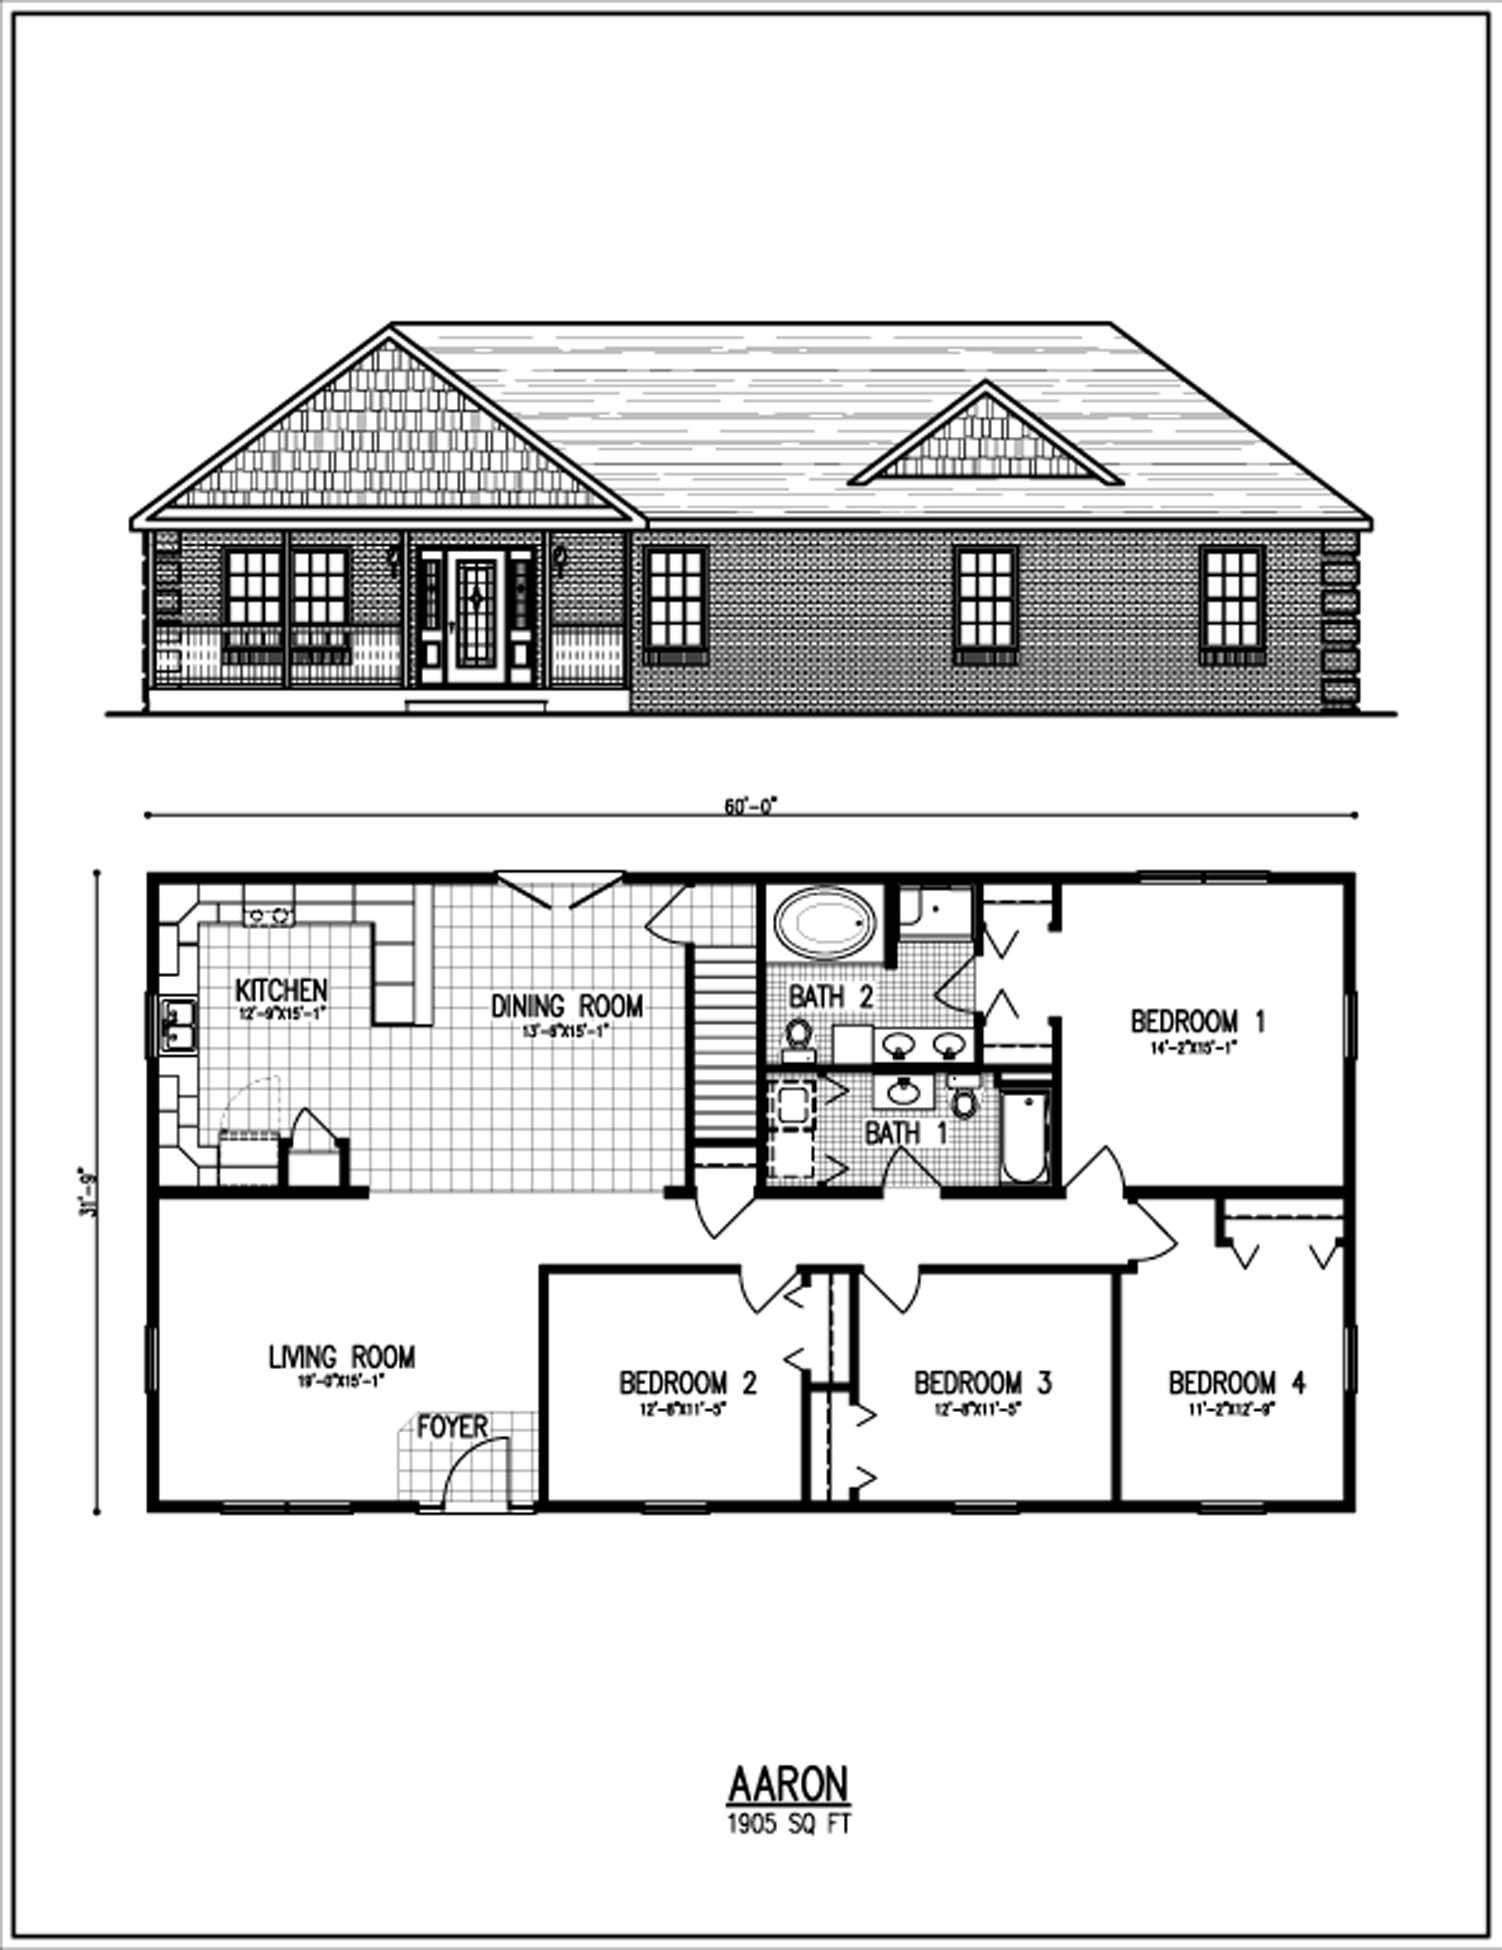 All American Homes Floorplan Center Staffordcape